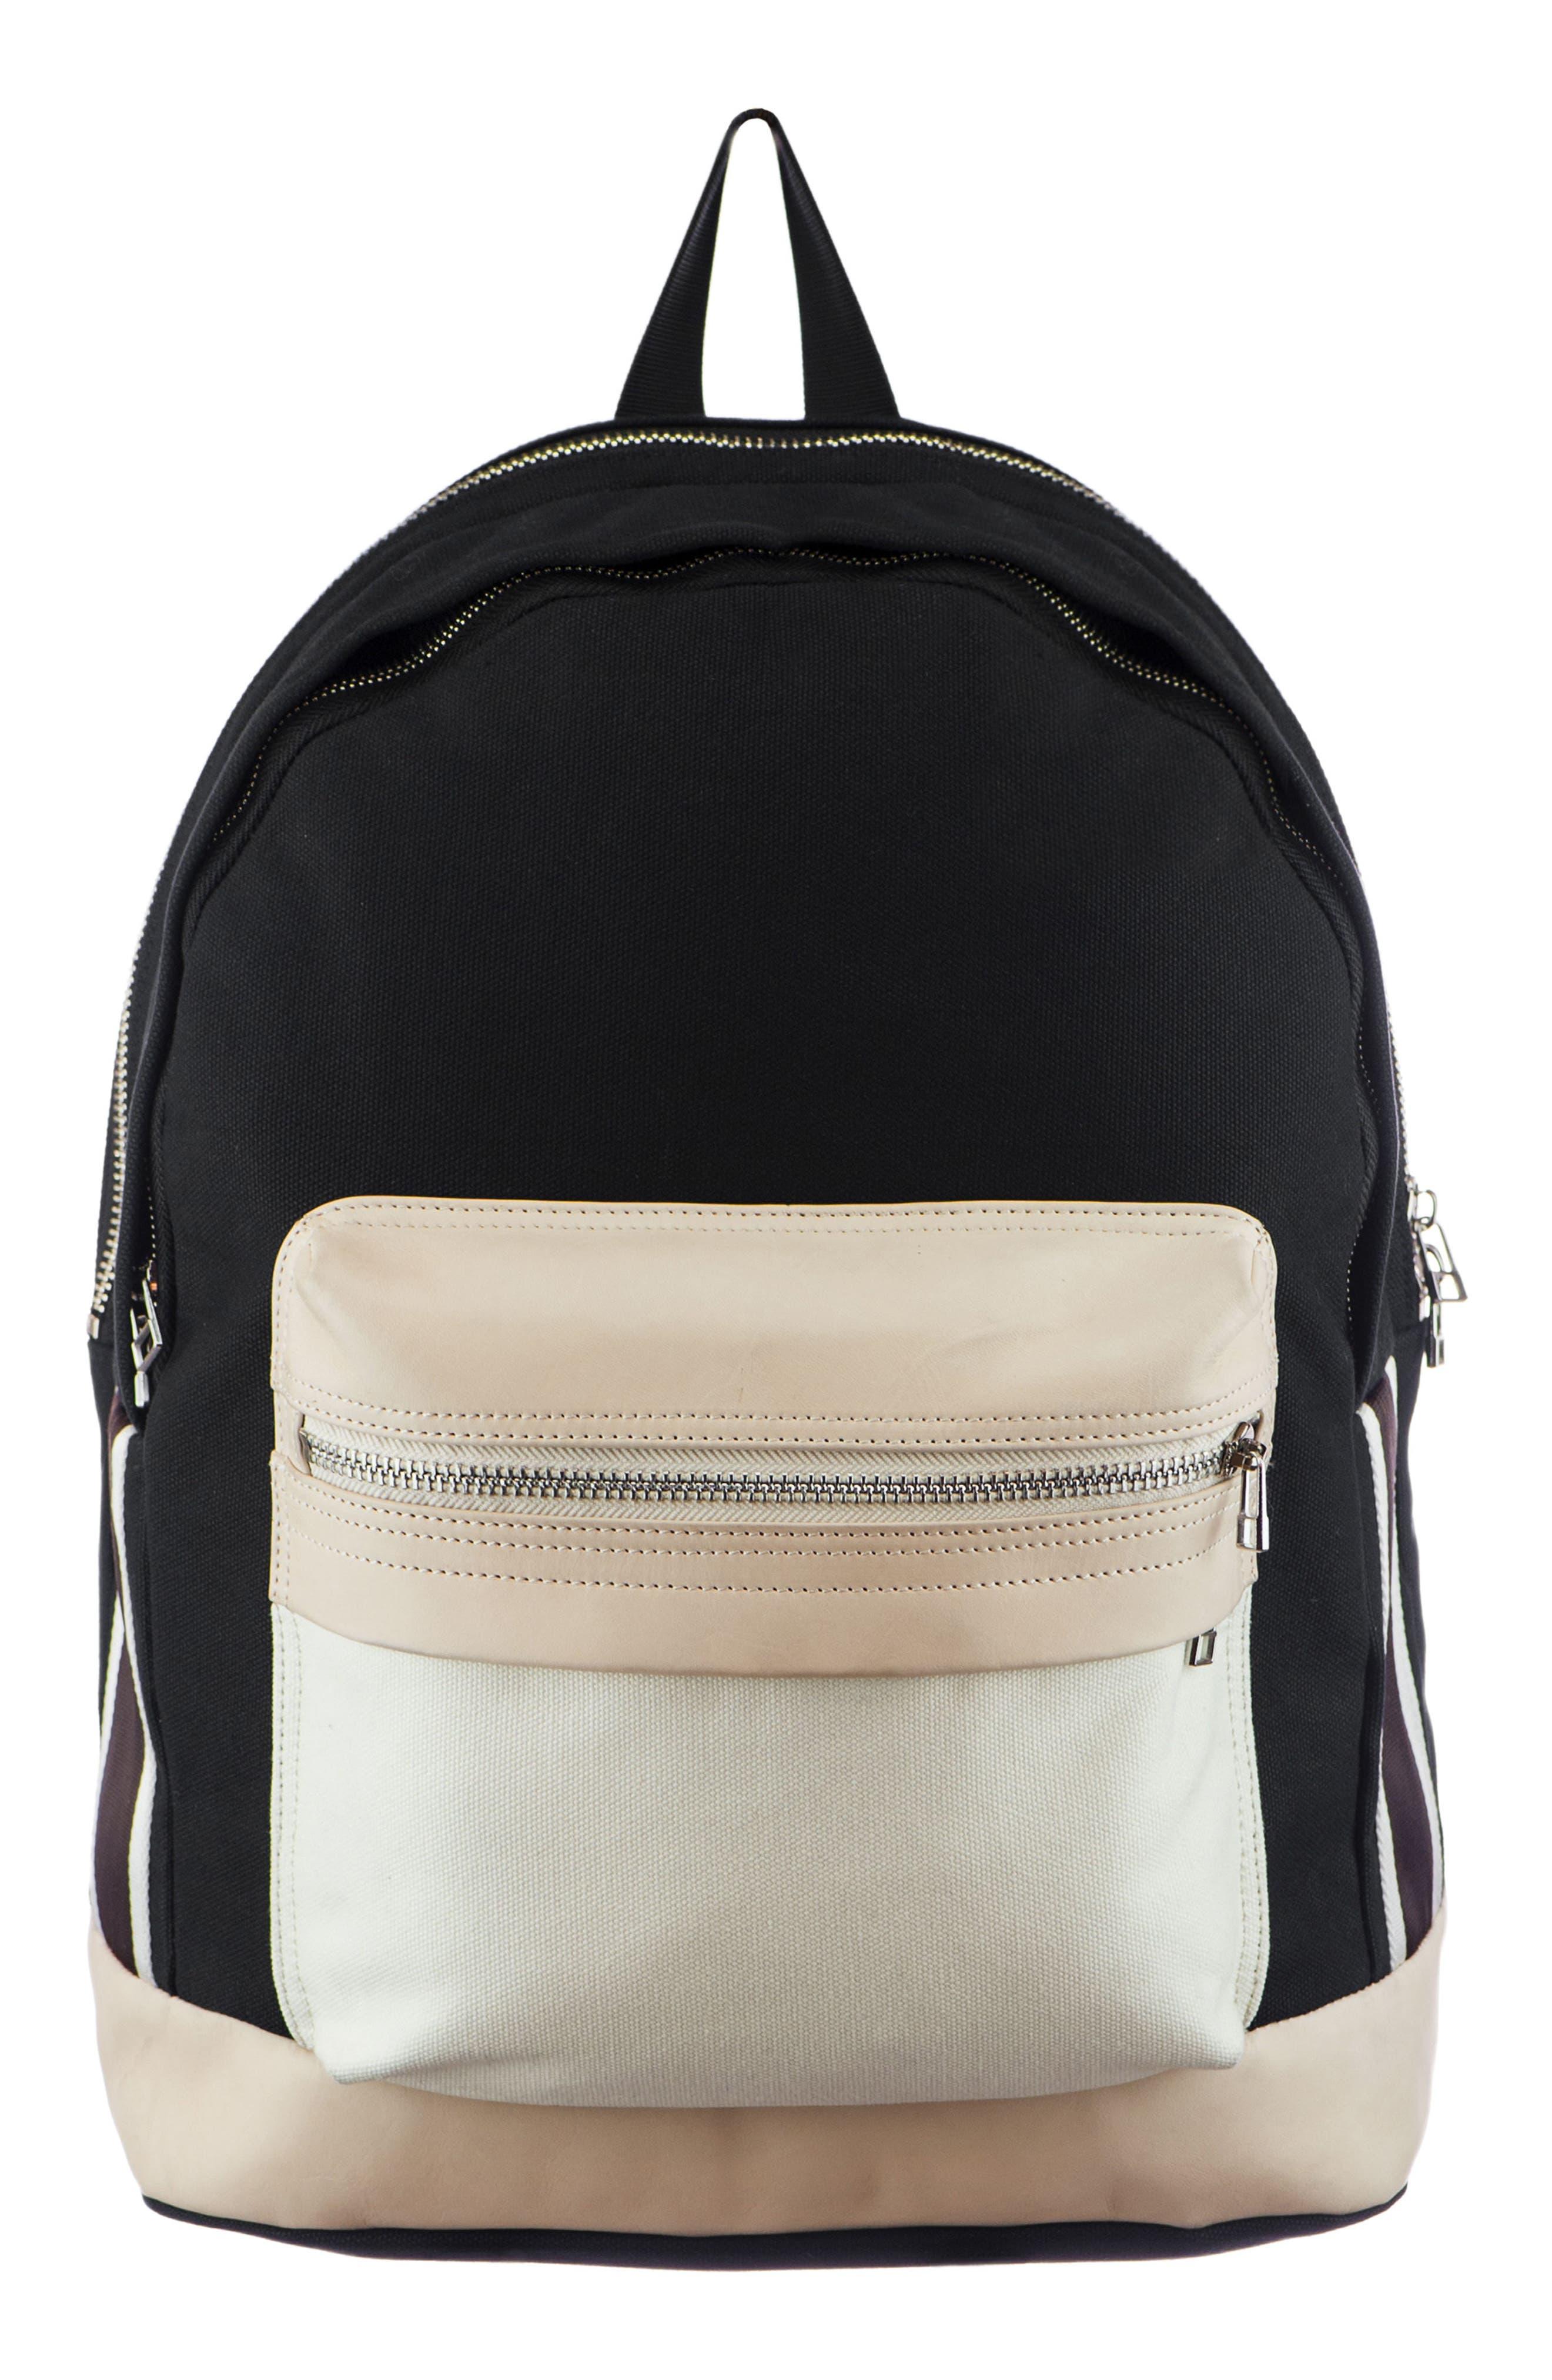 Alternate Image 1 Selected - Taikan Lancer Backpack